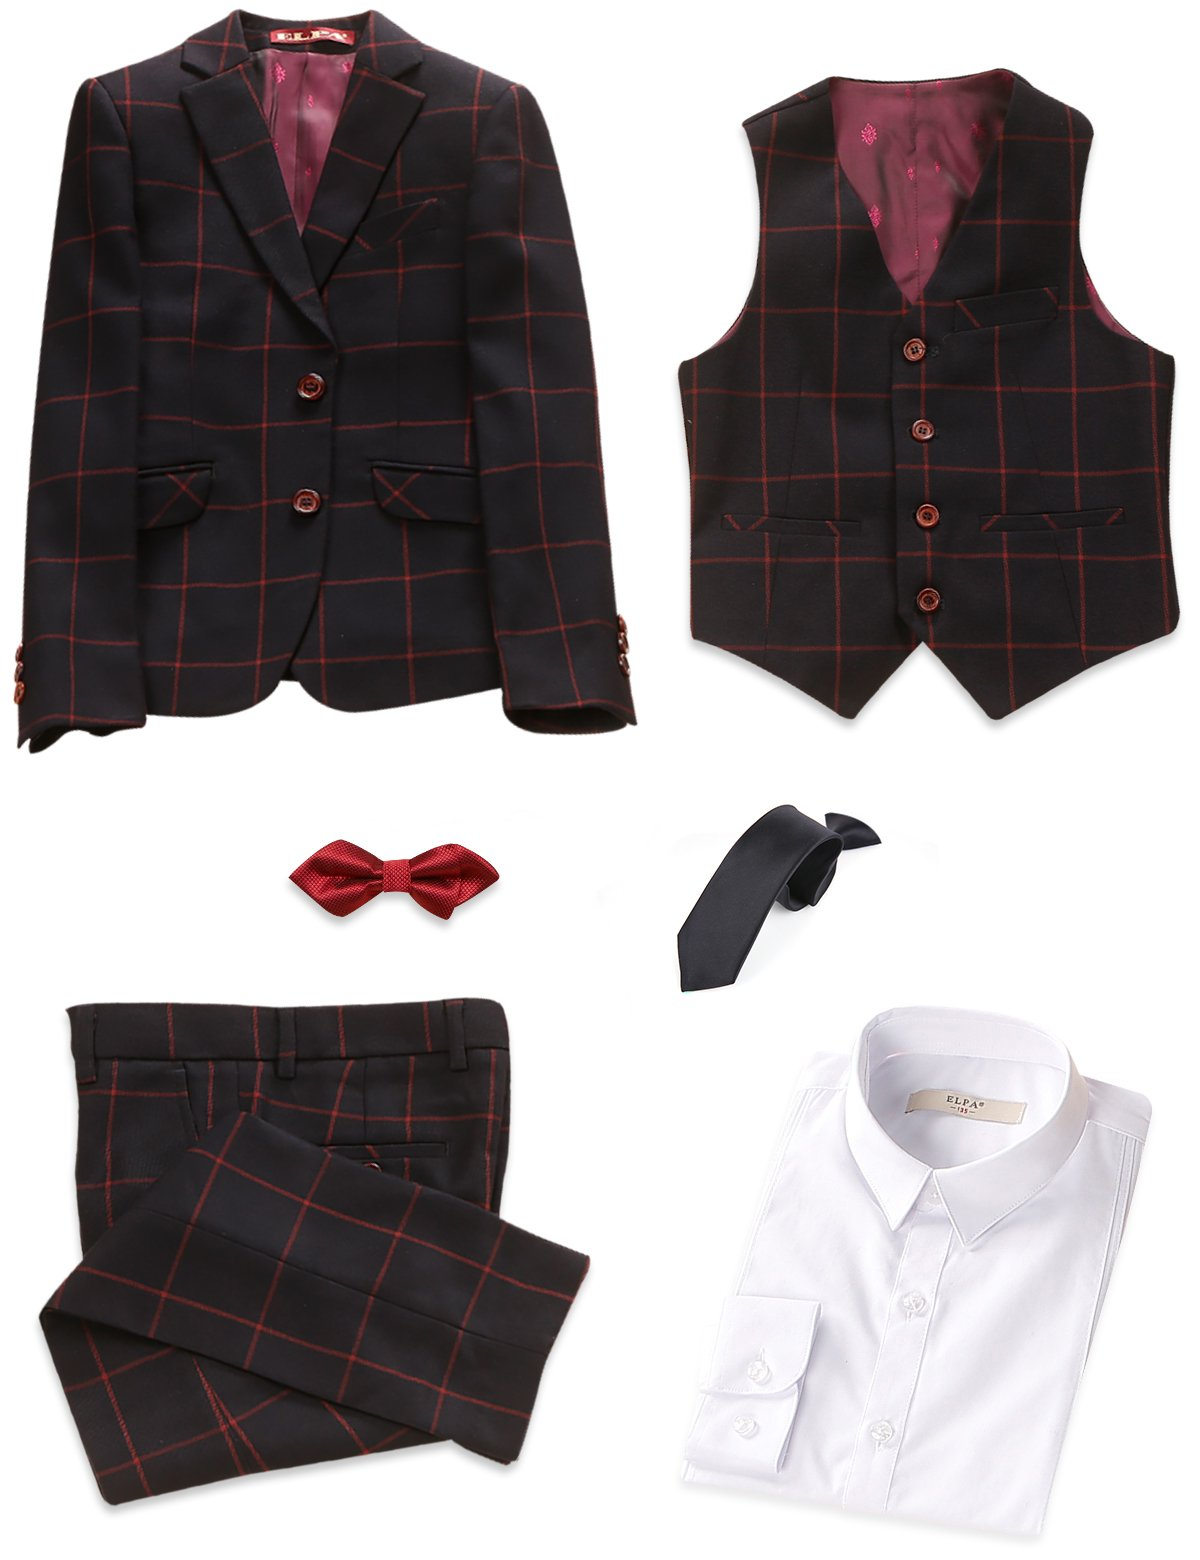 ELPA ELPA Boys Plaid Suit 6 Pcs Slim Fit Dress Formal Suit Set by ELPA ELPA